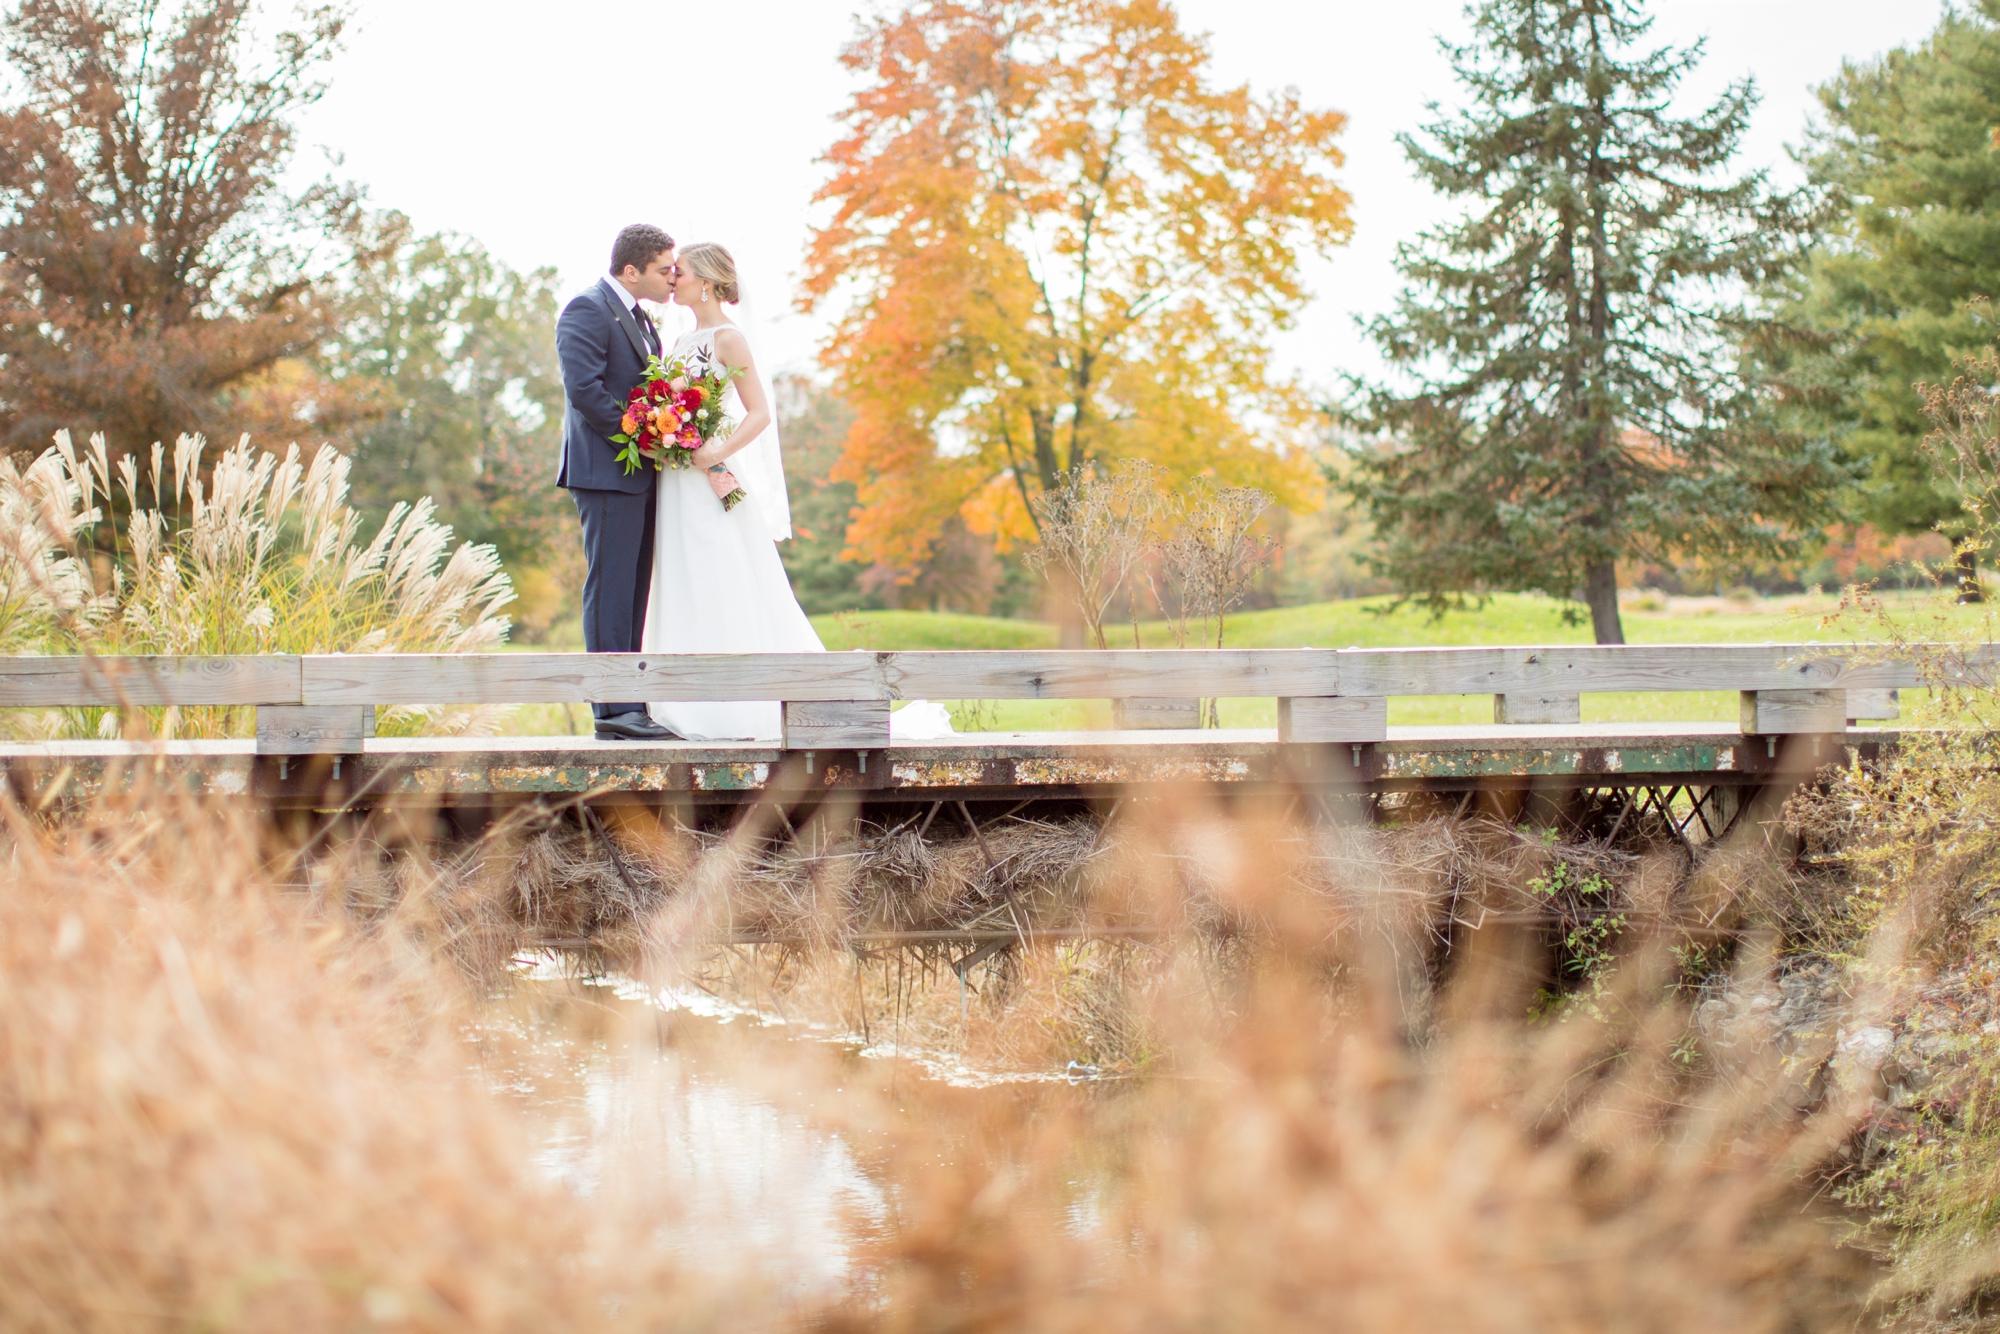 2-Finkel Wedding Bride & Groom Portraits-340_anna grace photography maryland wedding photographer turf valley.jpg